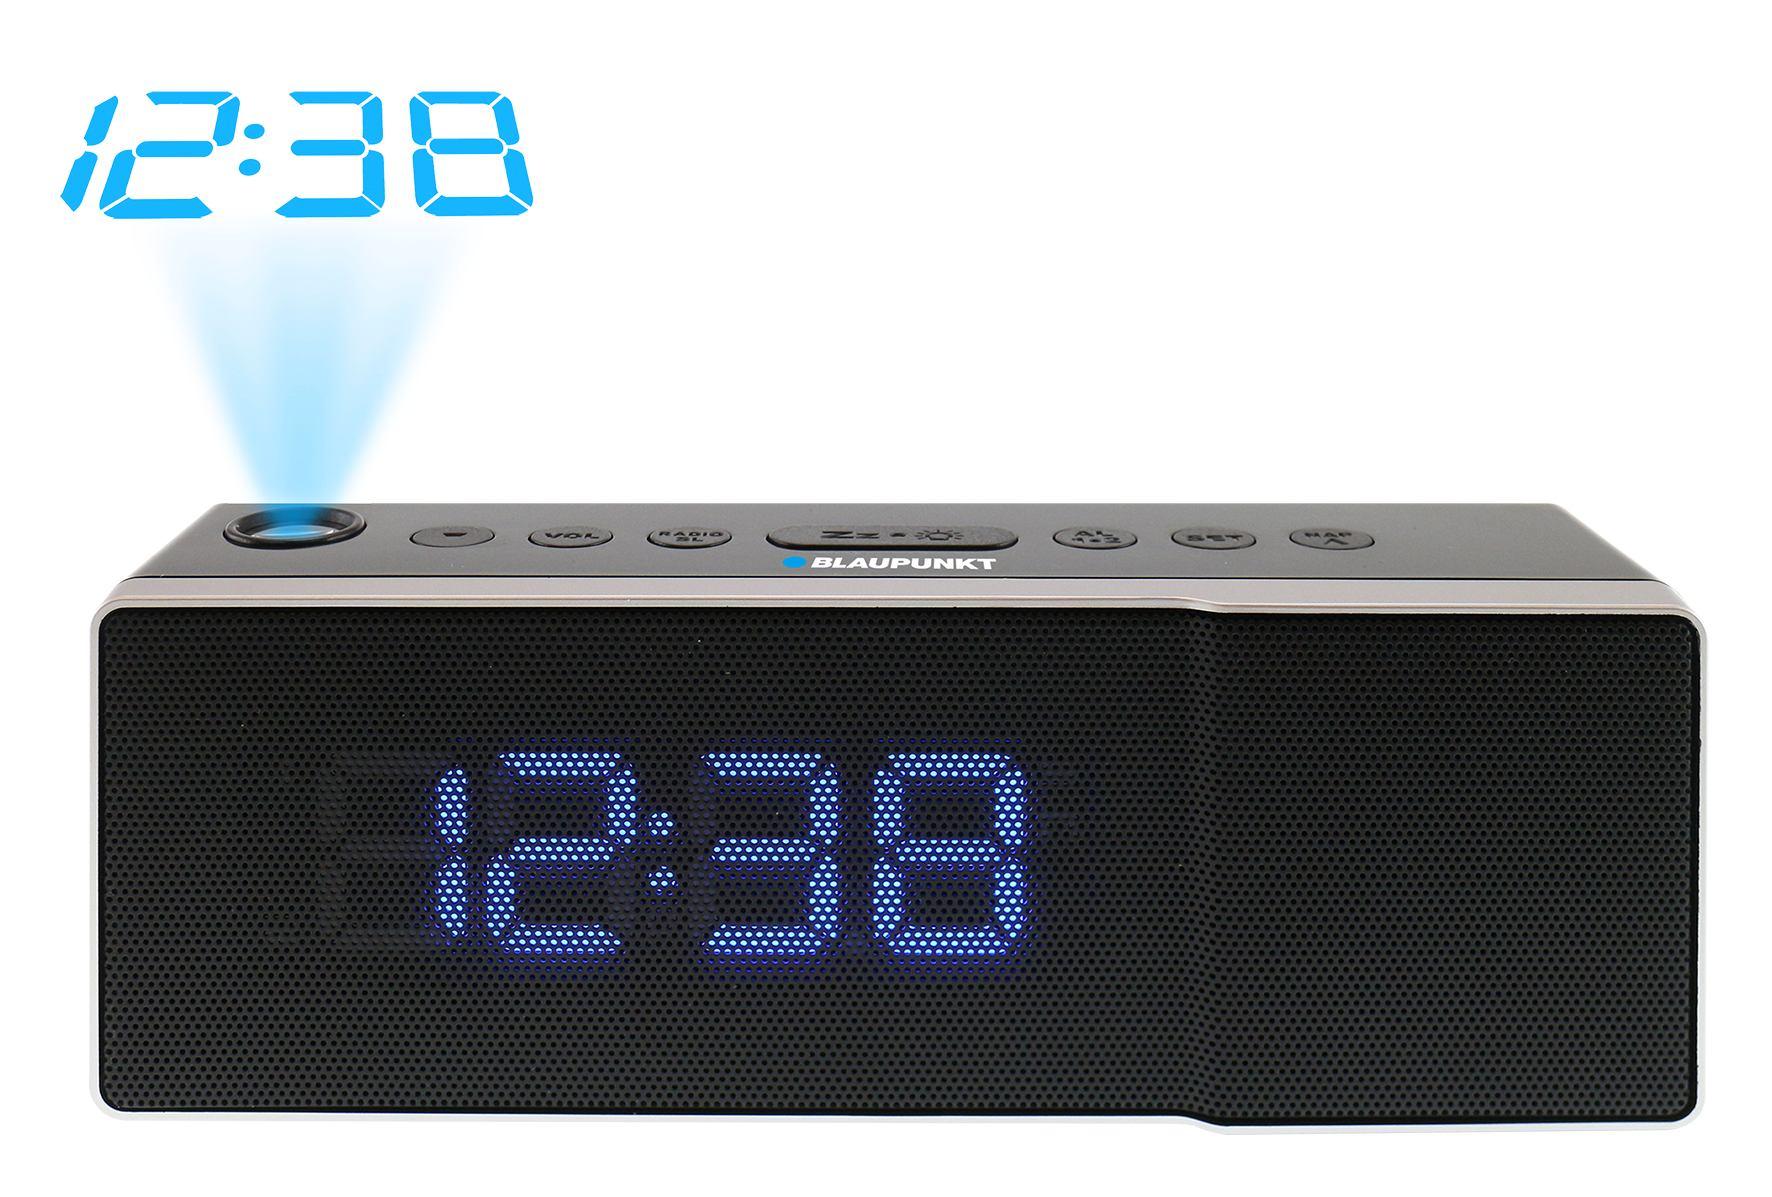 Blaupunkt Reloj Negro Crp8bk Radio Crp8bk Blaupunkt tdhCBxQrs